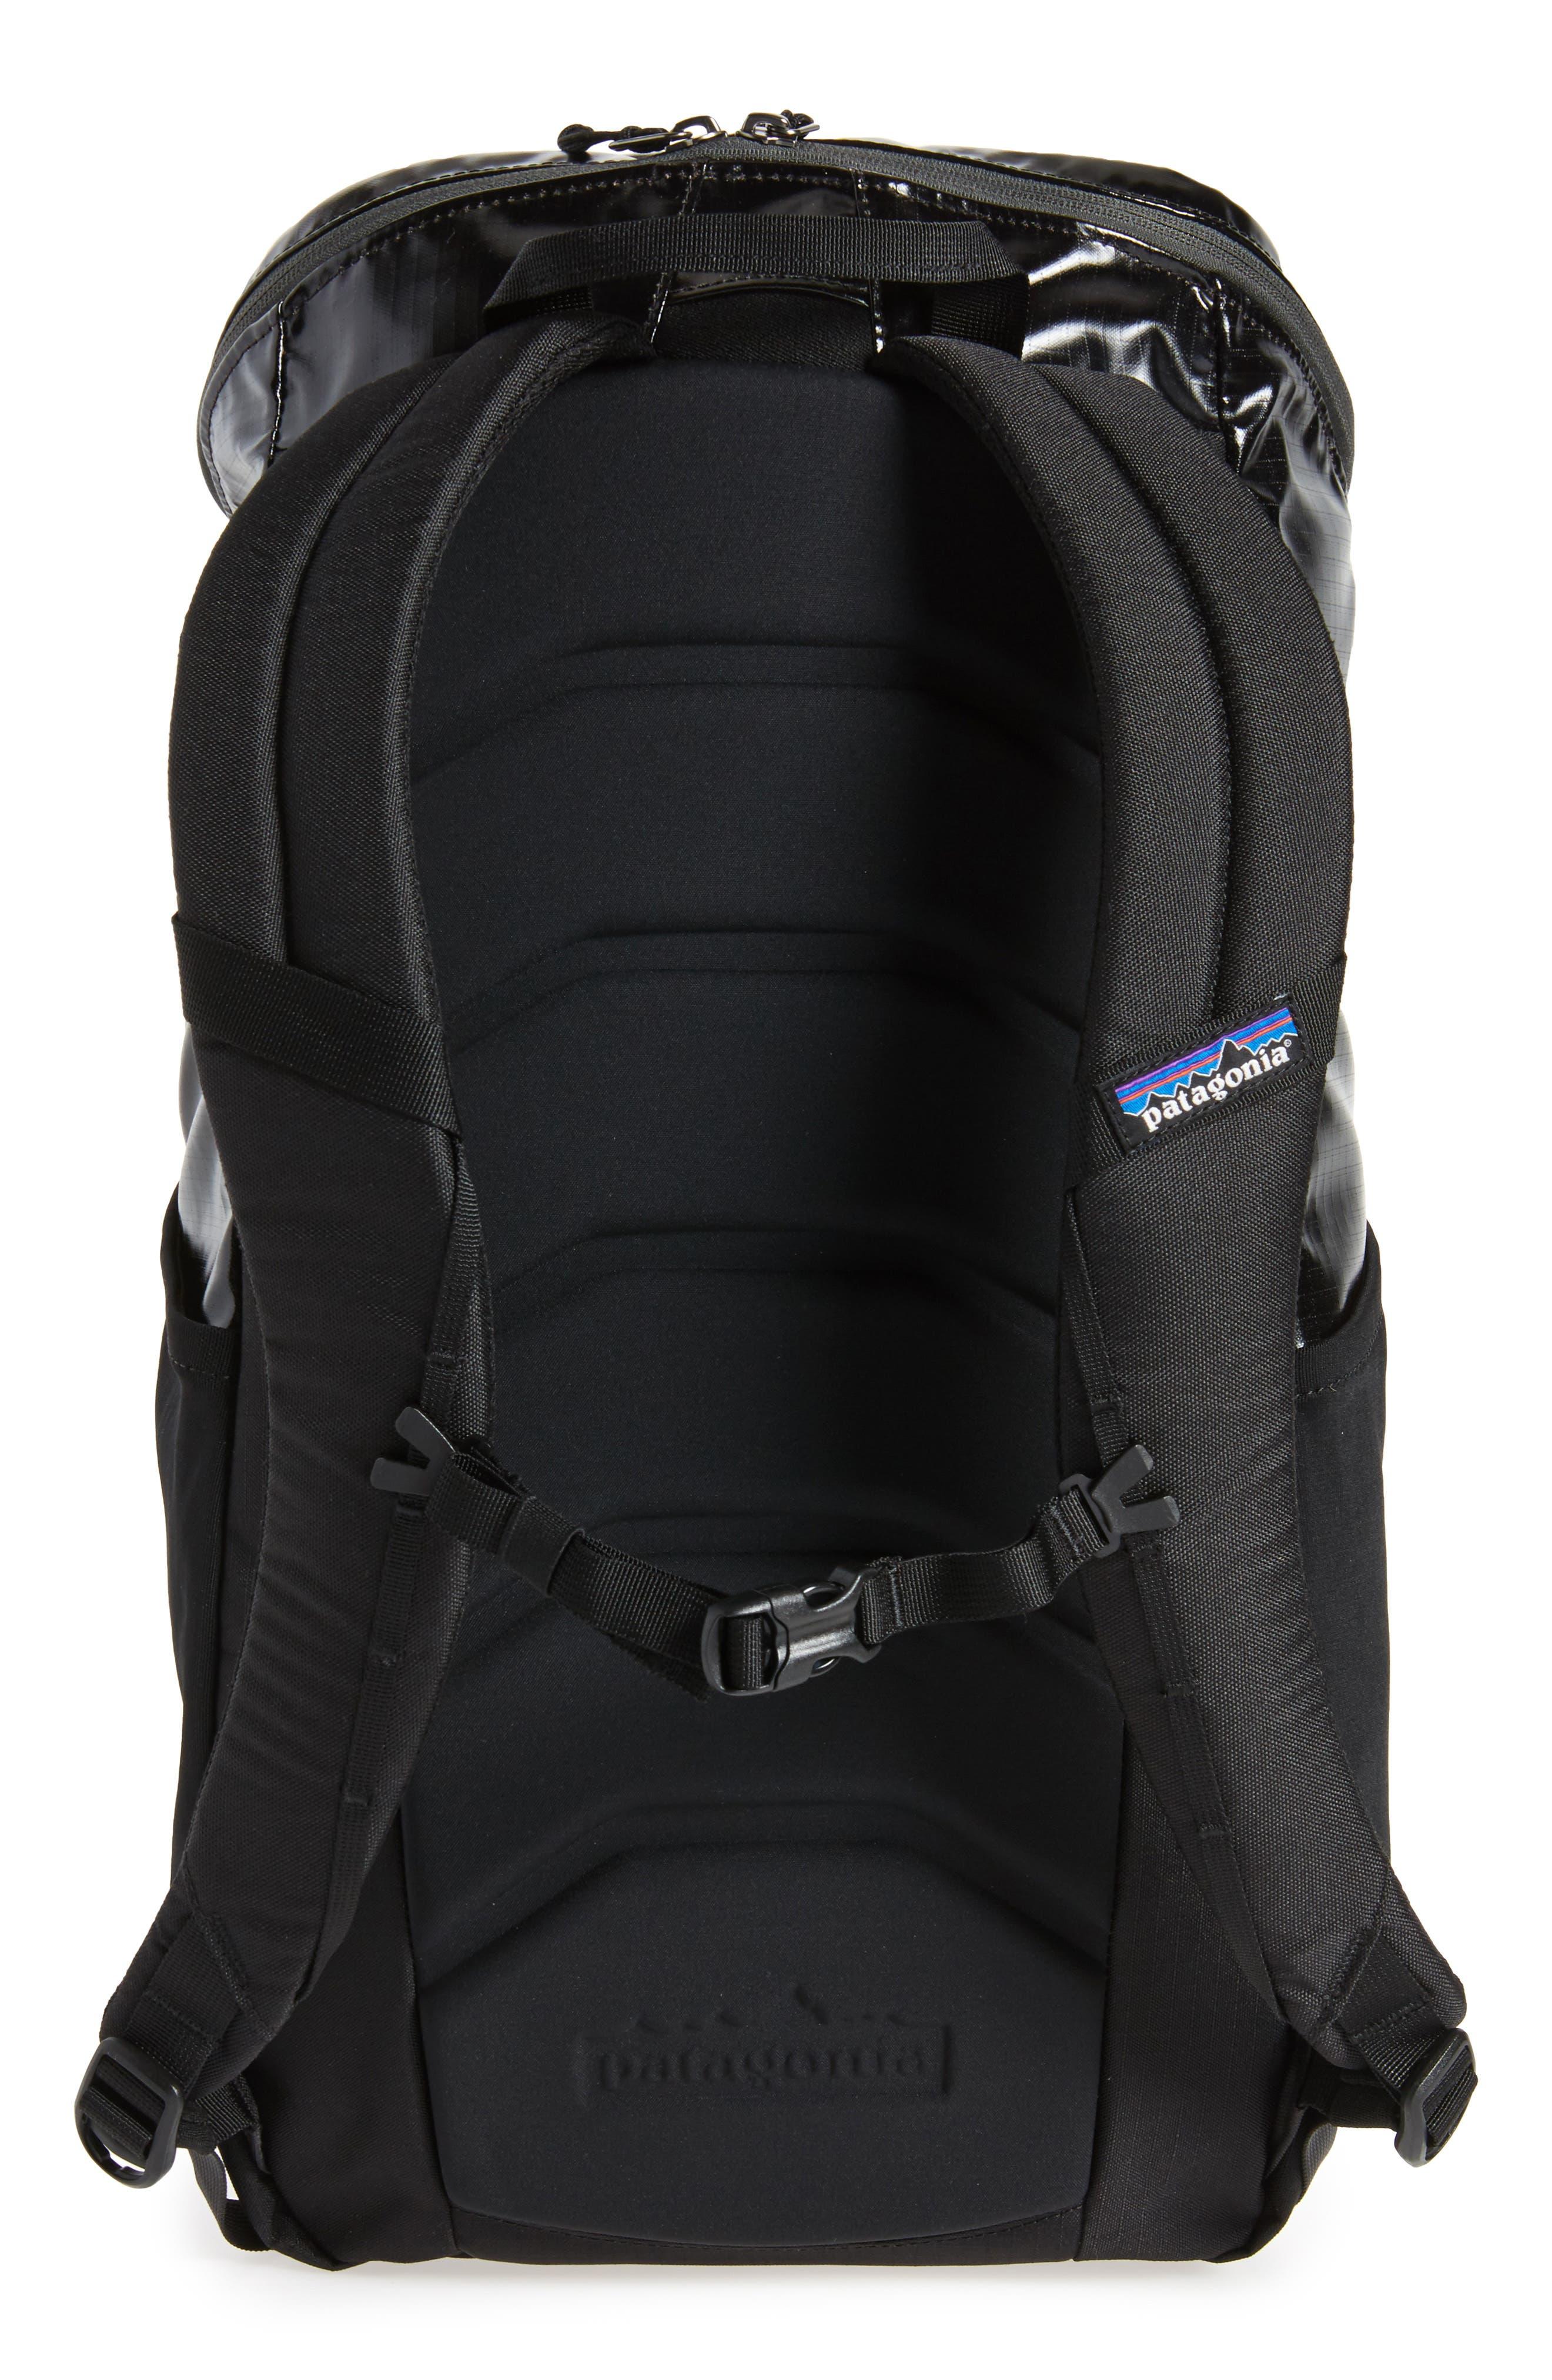 Black Hole 25 Liter Backpack,                             Alternate thumbnail 3, color,                             Black